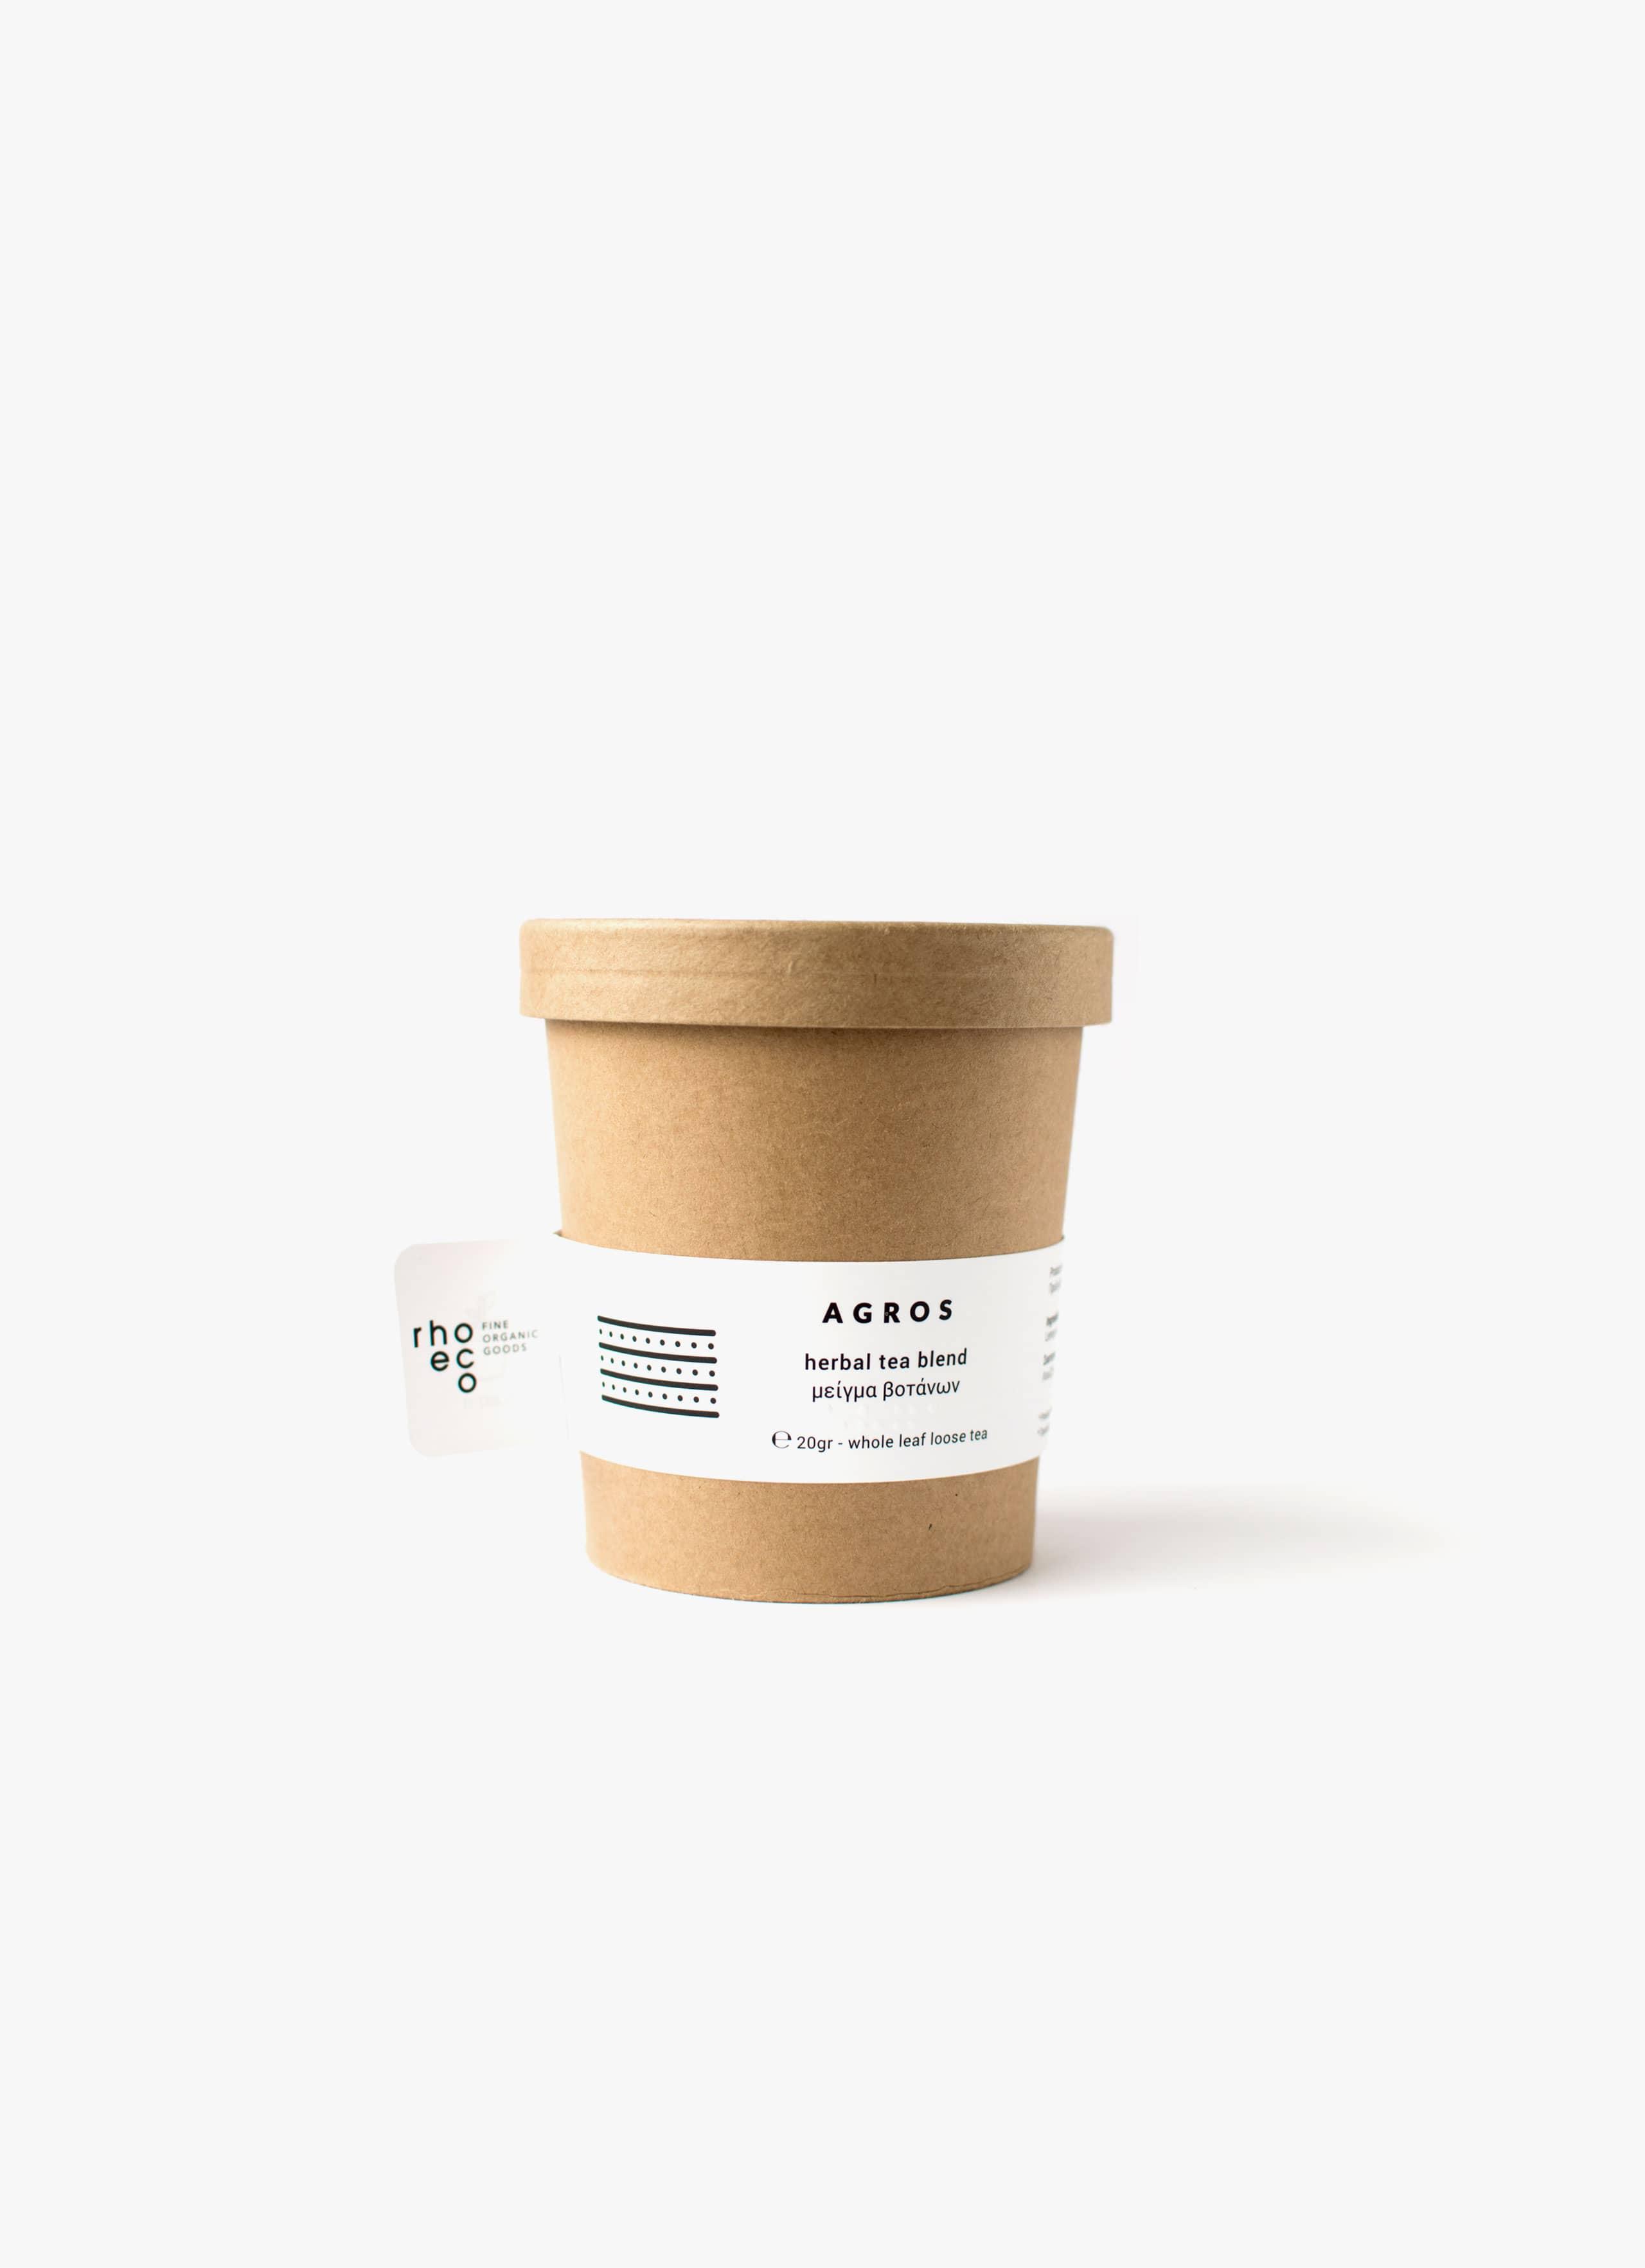 Rhoeco - Organic Tea - Drink it - Plant it - Agros